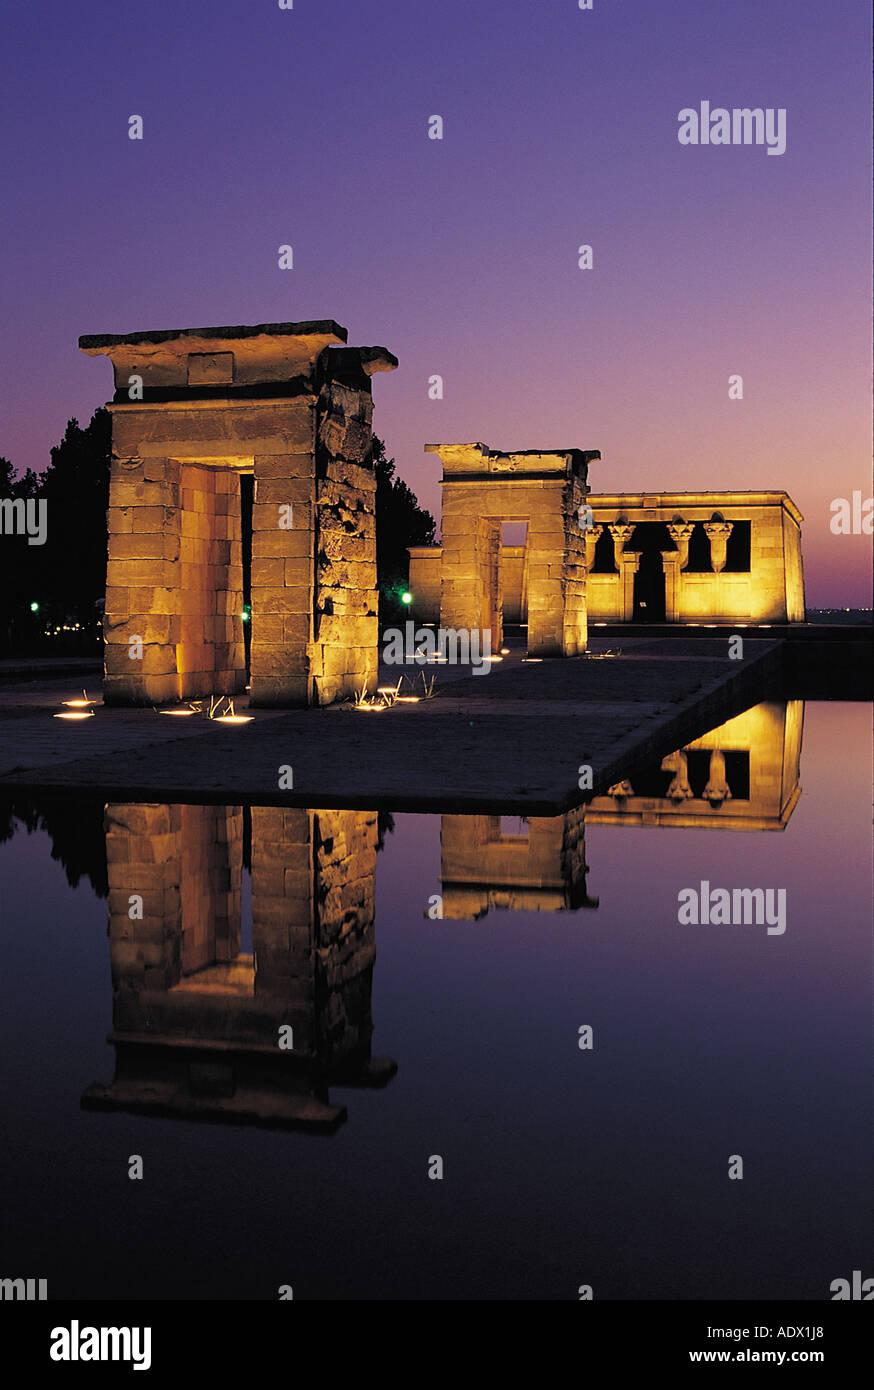 Temple de Debod, Madrid, Spain, evening, tourist, Madrid, Spain, brilliant, chapel, monument, arquitecture, egipto, travel - Stock Image